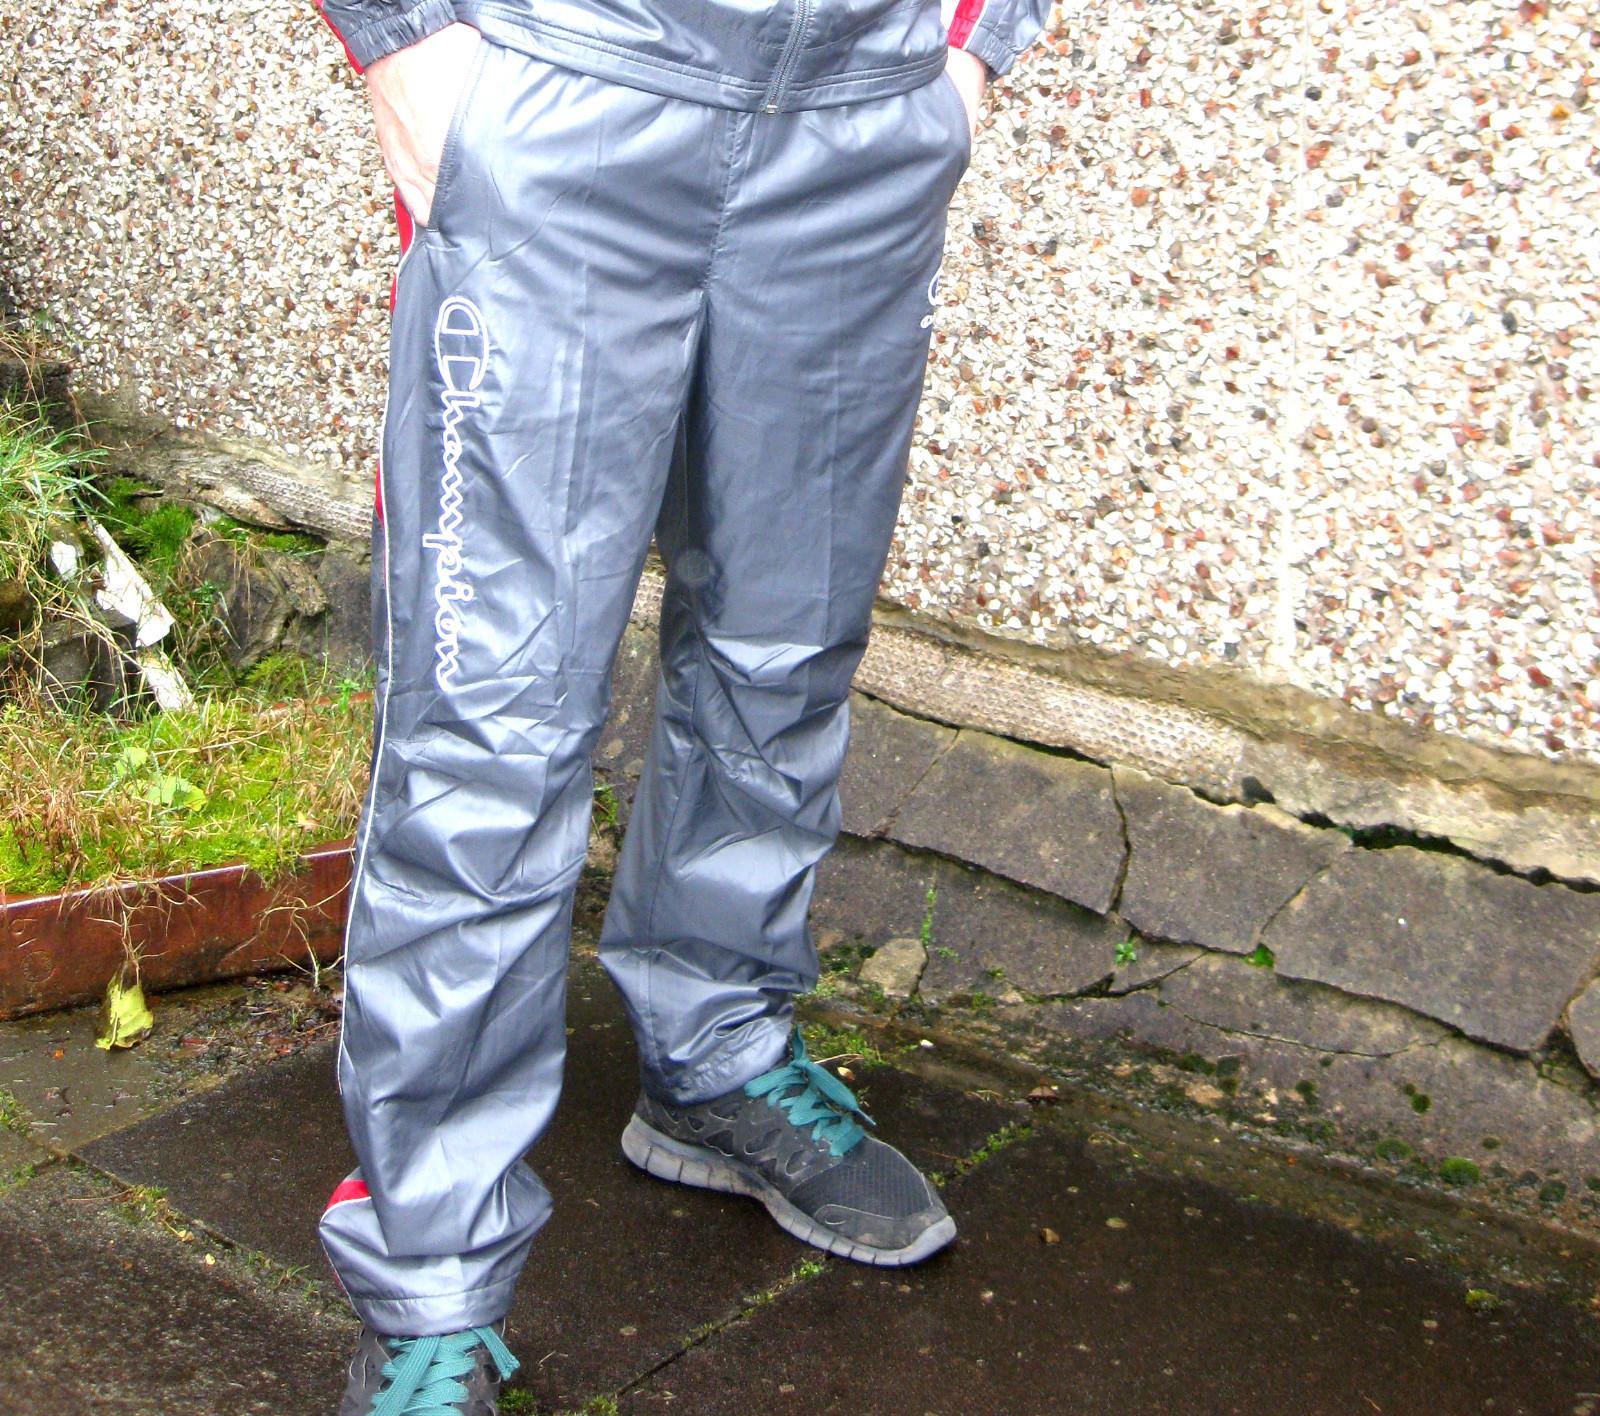 More Shiny Champion Sportswear